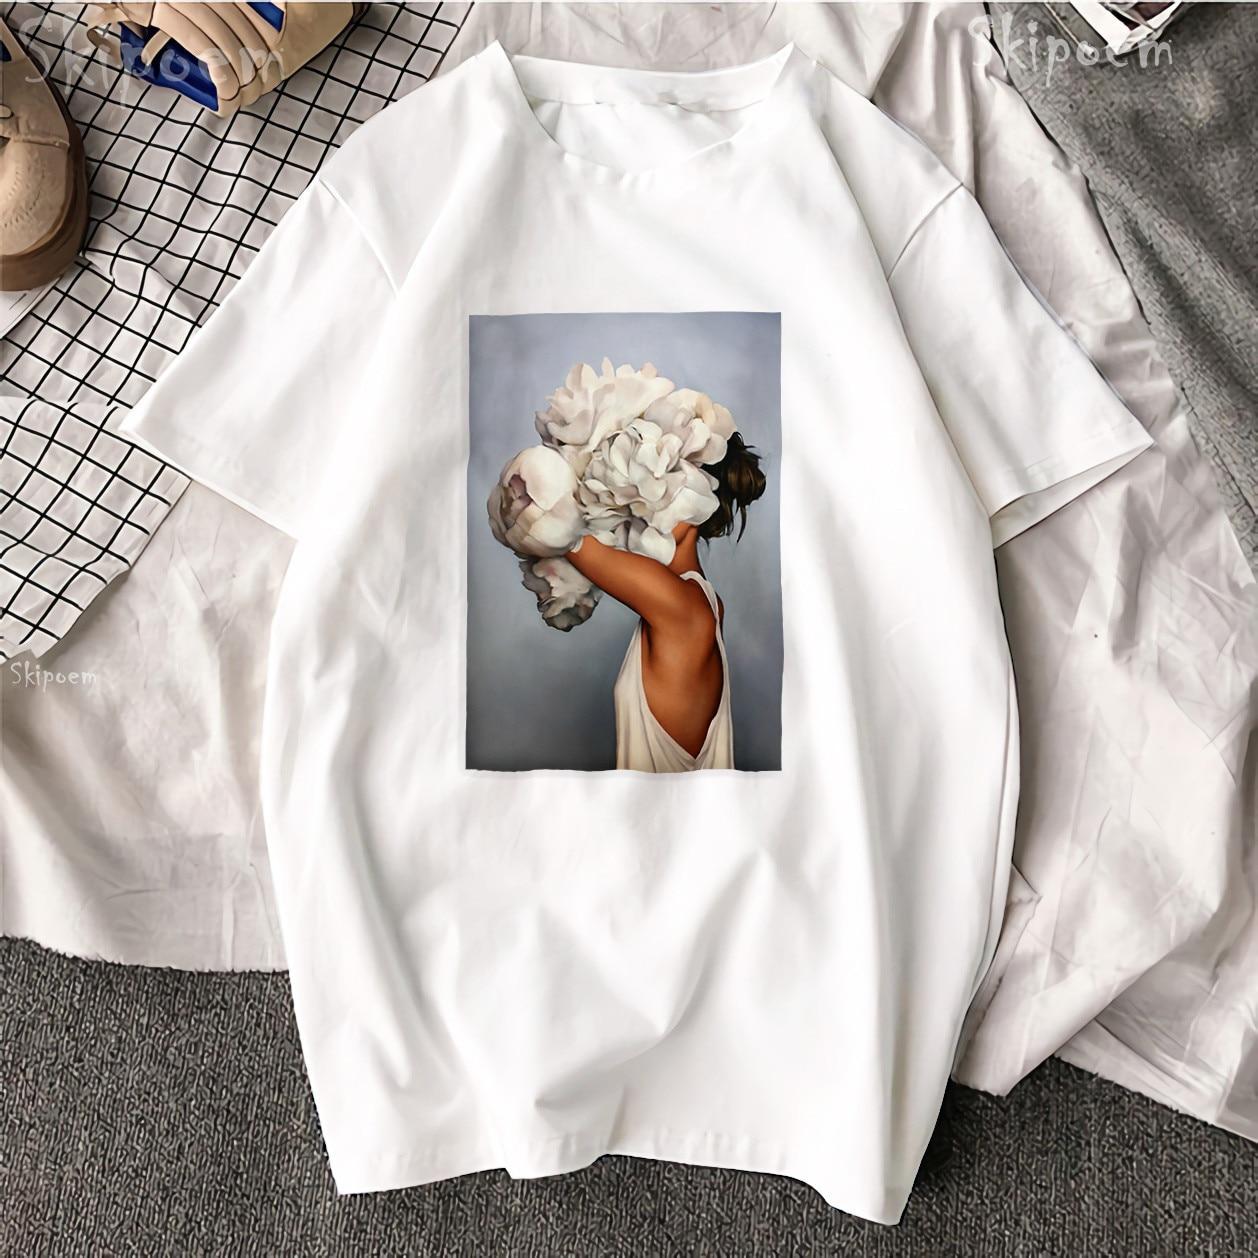 New 100% Cotton Harajuku Aesthetics Tshirt Sexy Flowers Feather Print Short Sleeve Tops & Tees Fashion Casual Couple T Shirt